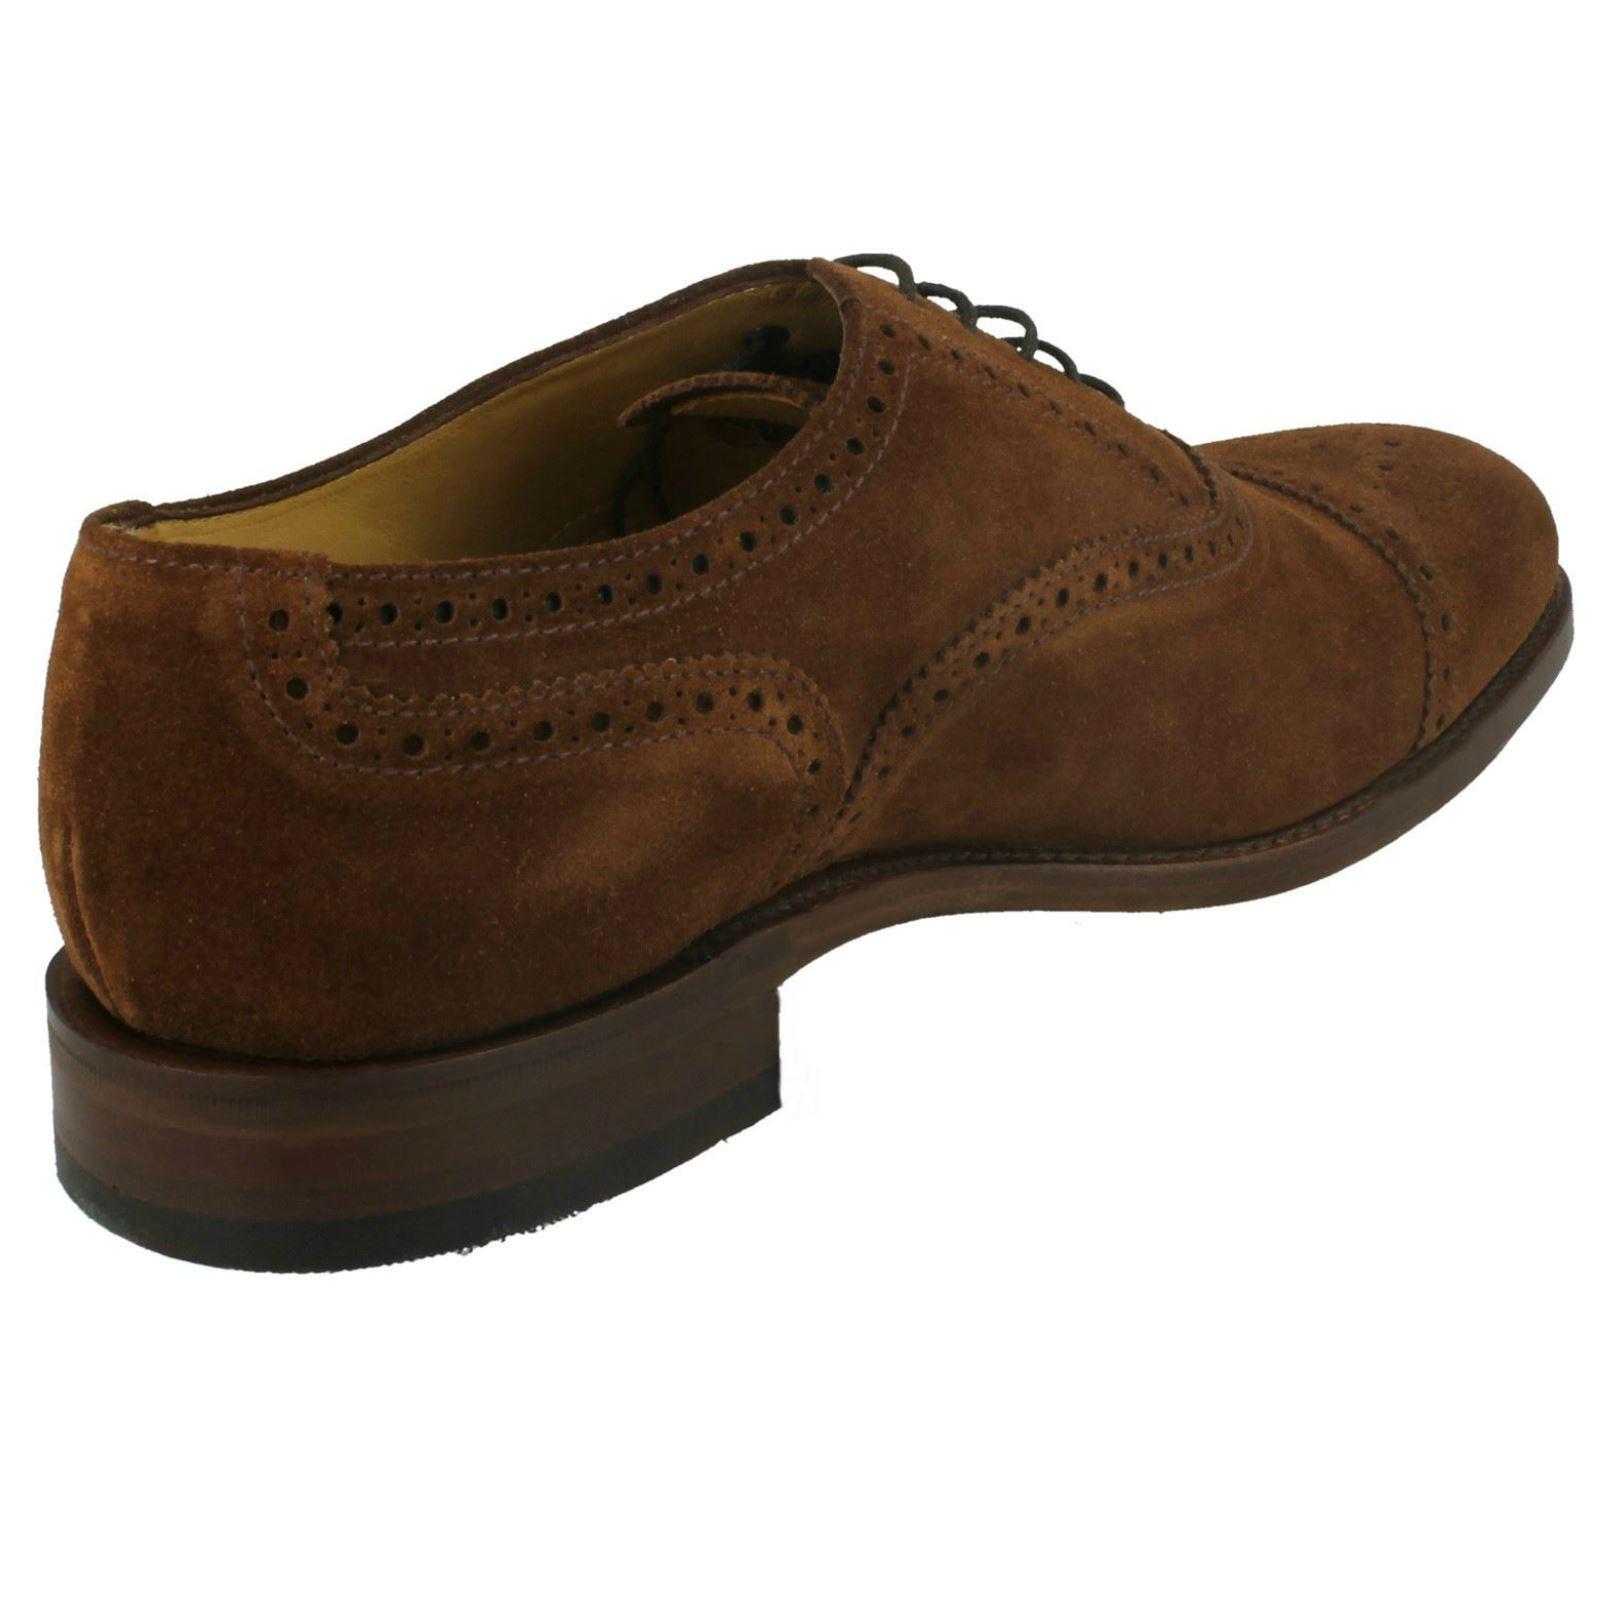 Da Uomo Loake SMART pelle-Tweed scarpe di pelle-Tweed SMART 2 26de60